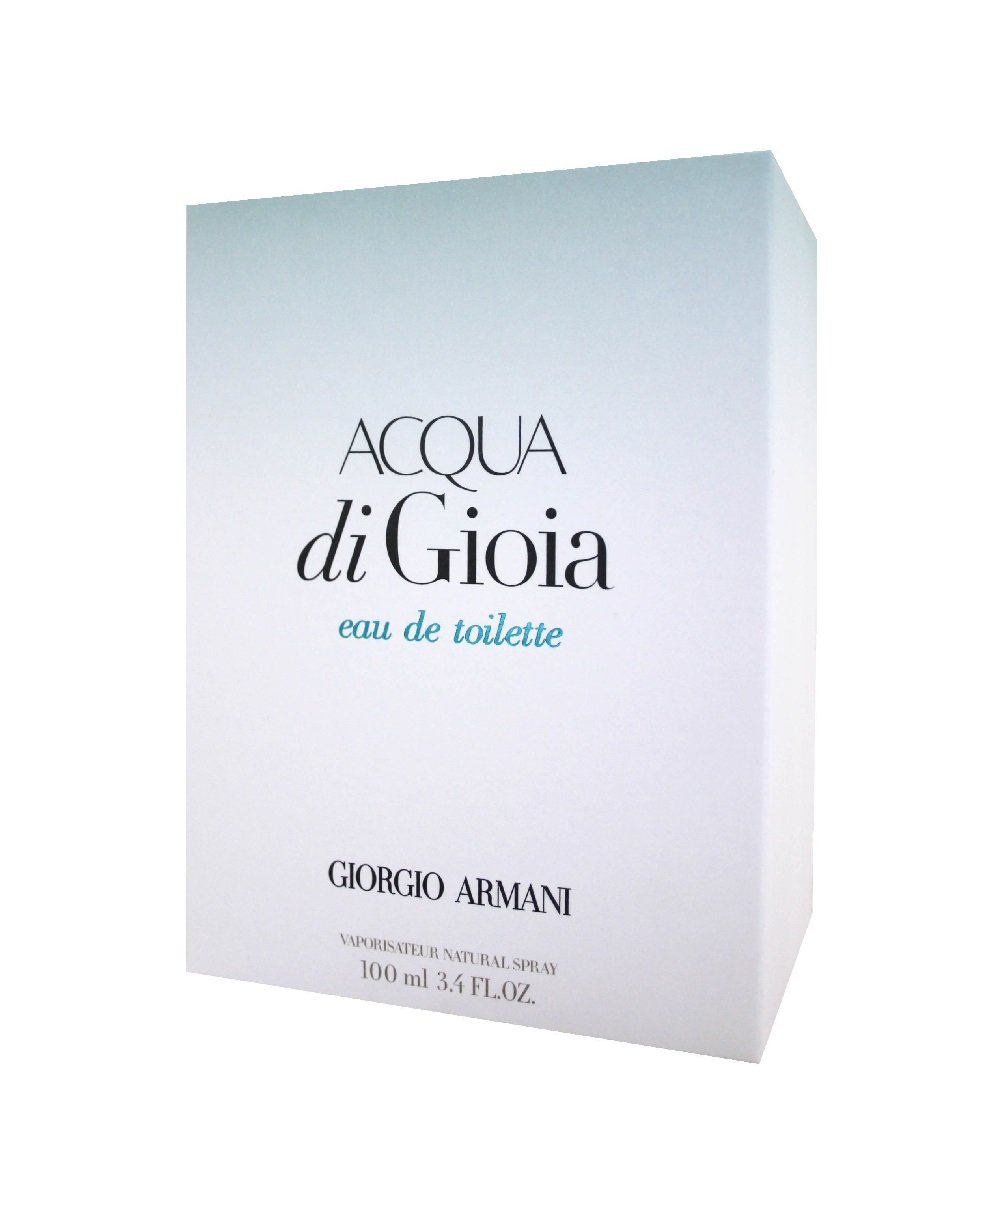 giorgio armani acqua di gioia eau de toilette kaufen parfumgroup de